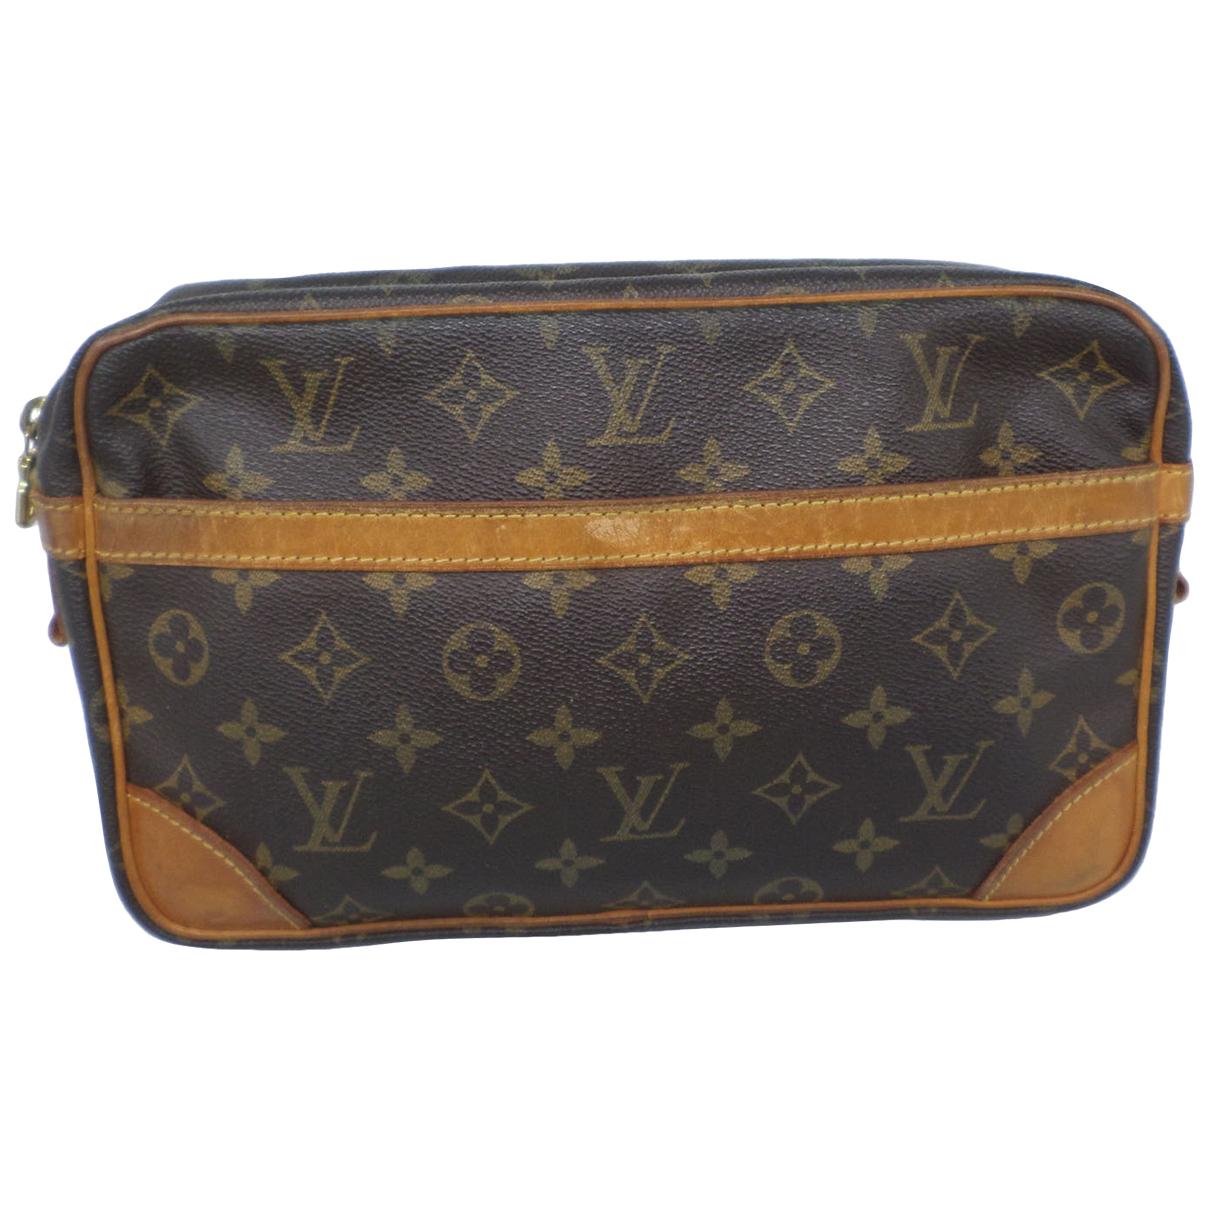 Louis Vuitton Compiegne 28 Brown Cloth Travel bag for Women \N